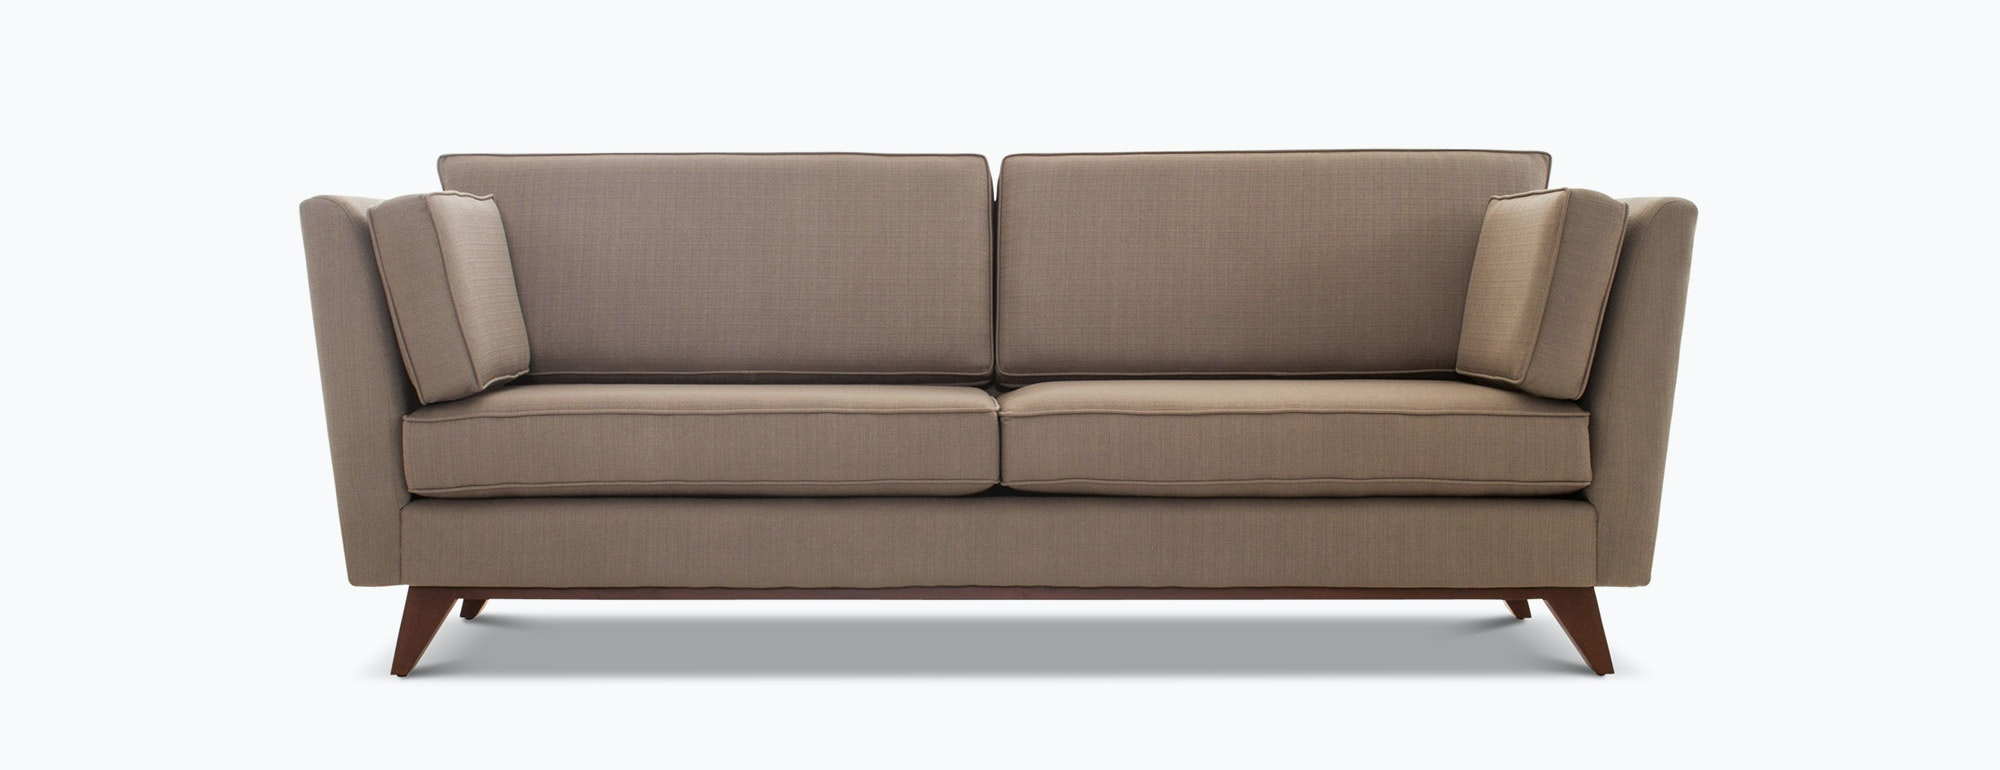 roller sofa joybird. Black Bedroom Furniture Sets. Home Design Ideas